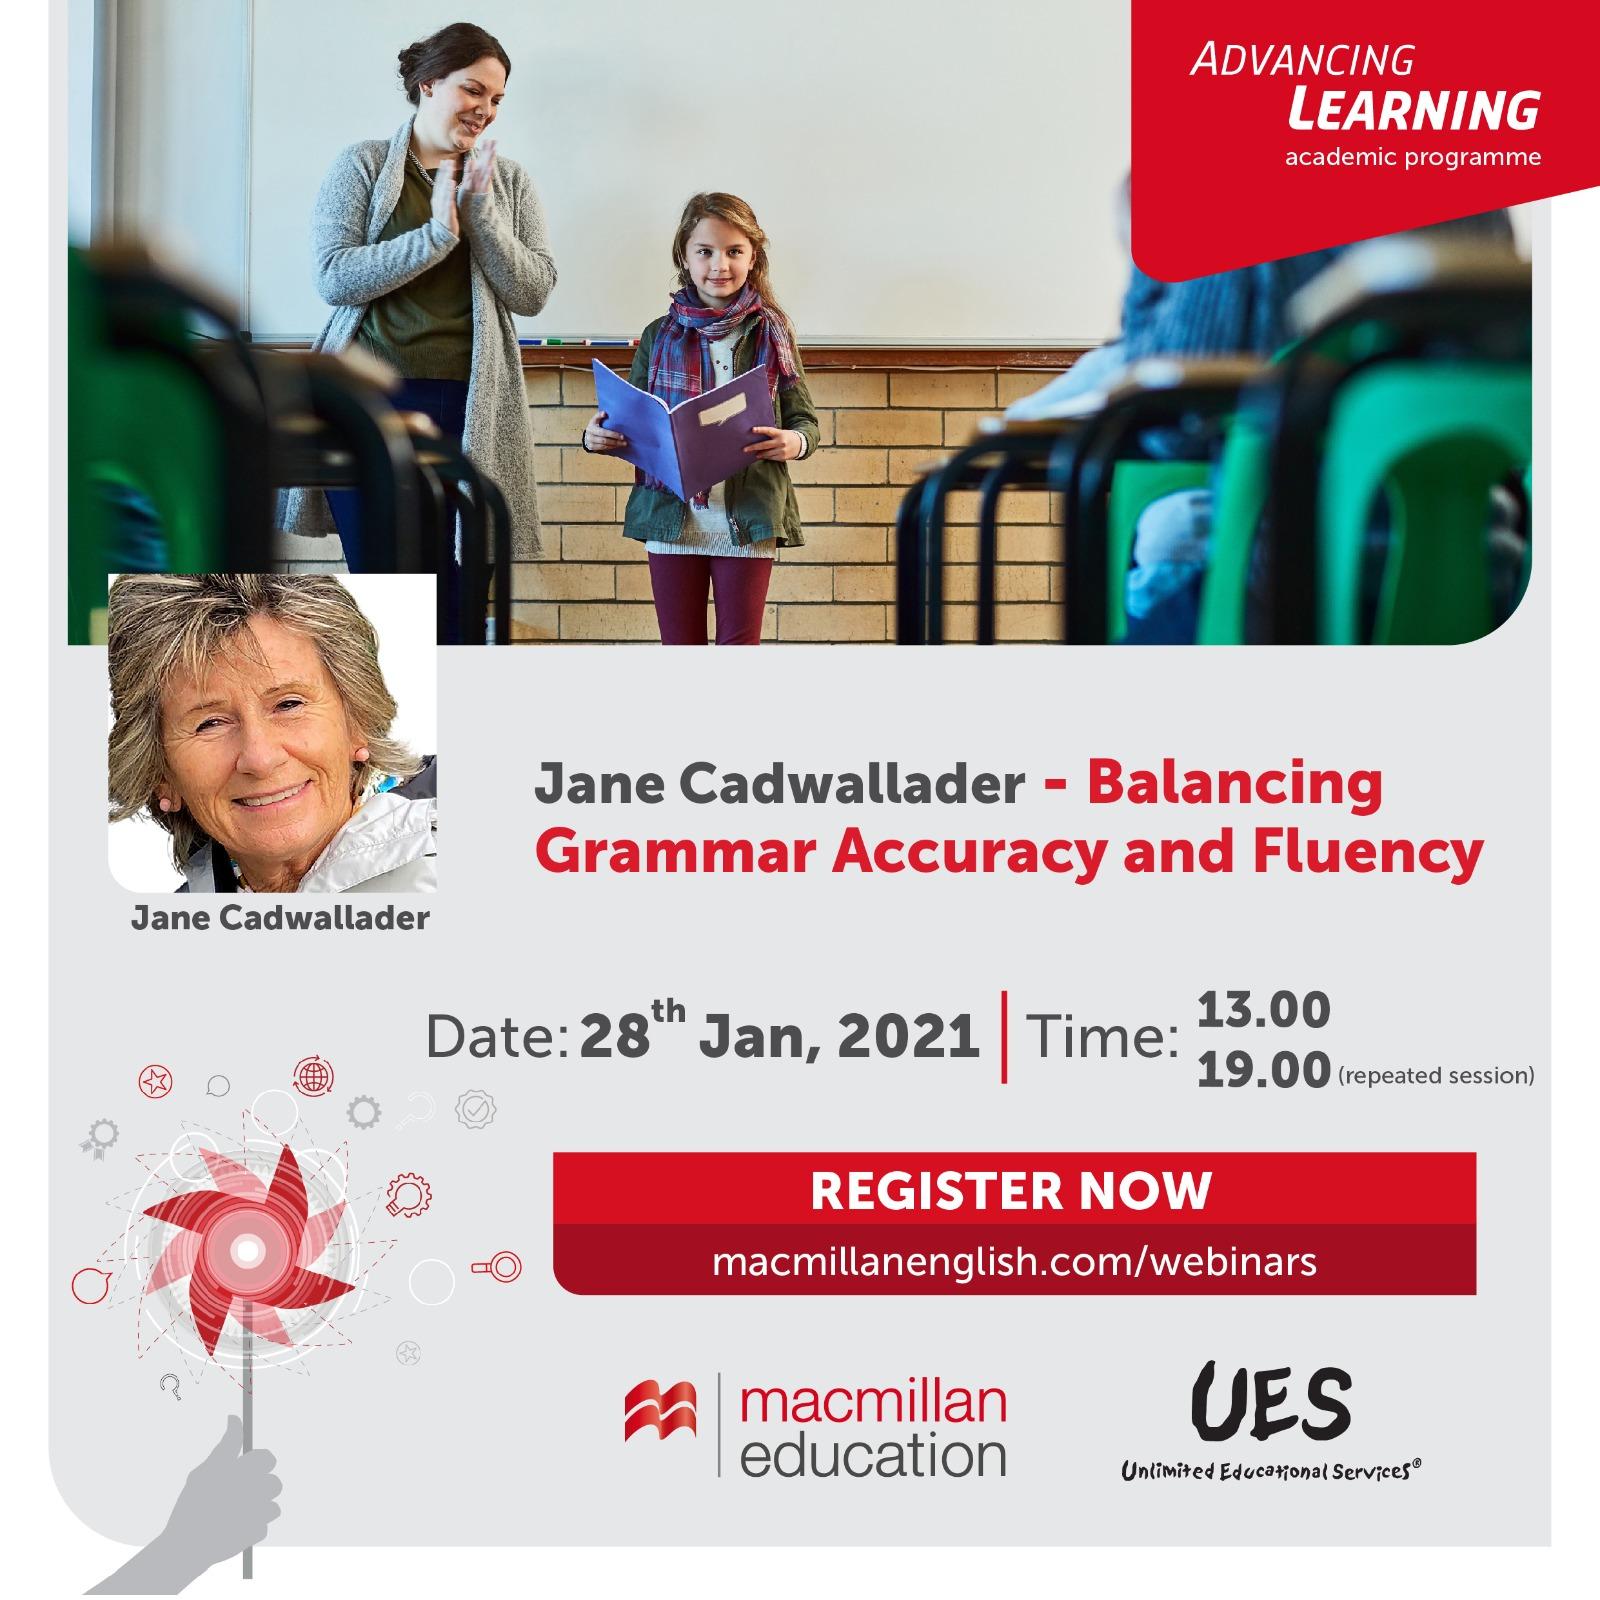 Jane Cadwallader – Balancing Grammar Accuracy and Fluency